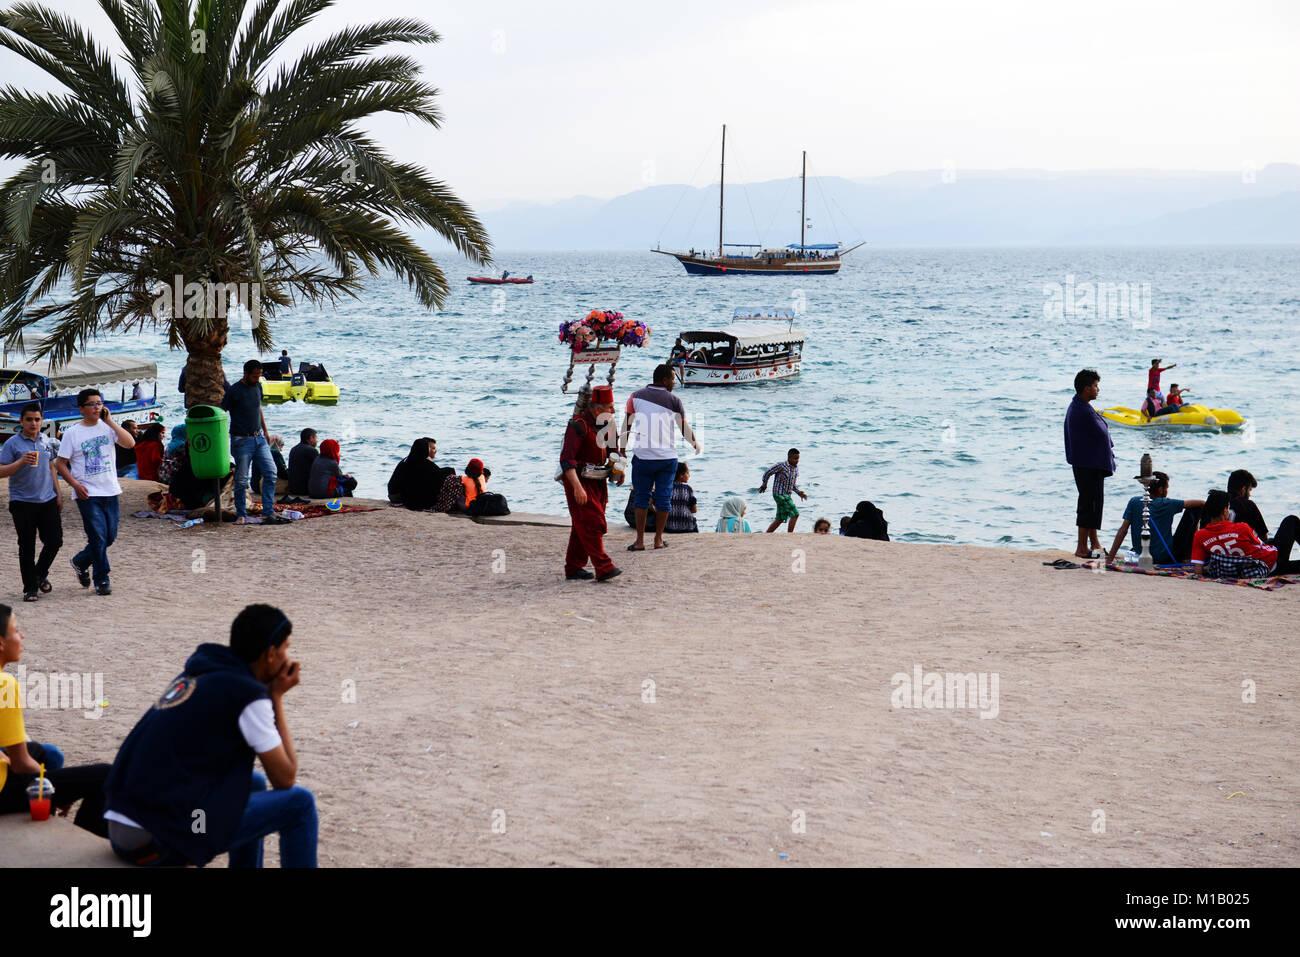 A traditional Tamarind juice vendor walking on Al-Ghandour Beach in Aqaba, Jordan. - Stock Image